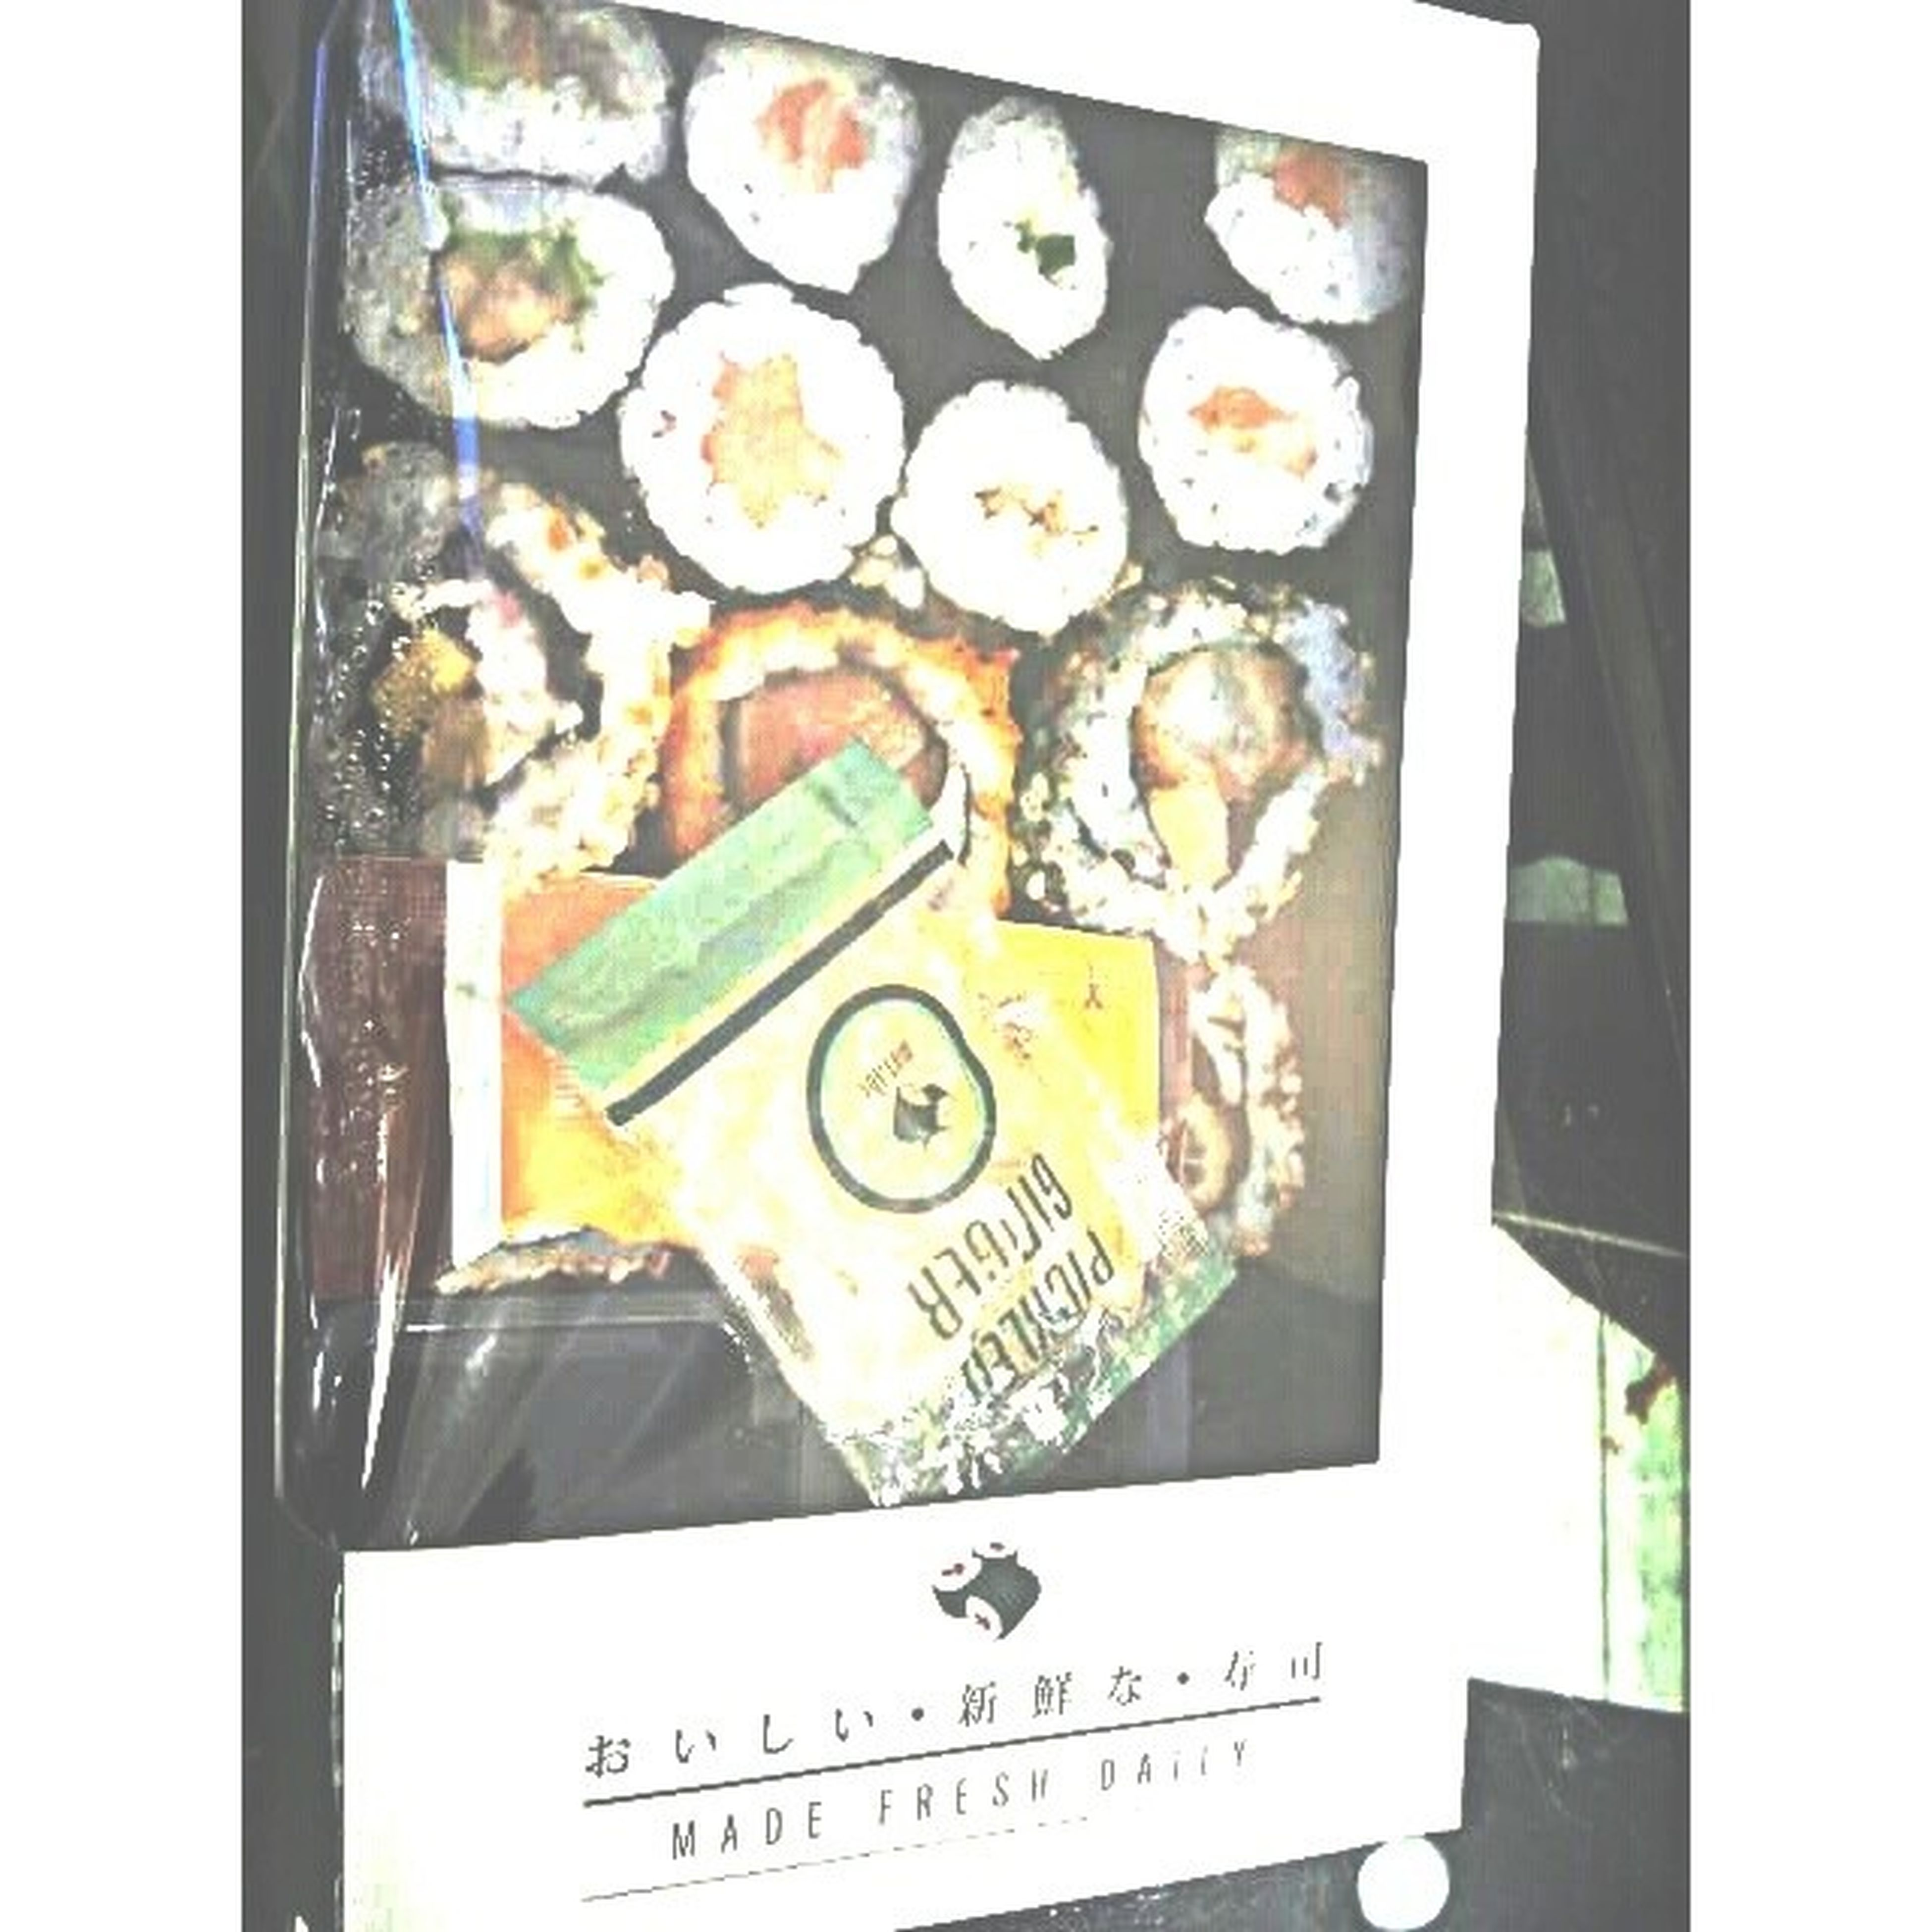 Sushi YumYum Food Inoxford letseatilovesushithebestfoodeverwanttoeatthisaldayinstalikeifyoulikesushifollowmeifollowbacktsuptsupshoutoutmeoxfordawesomefoodkoolioyoloootdgeek